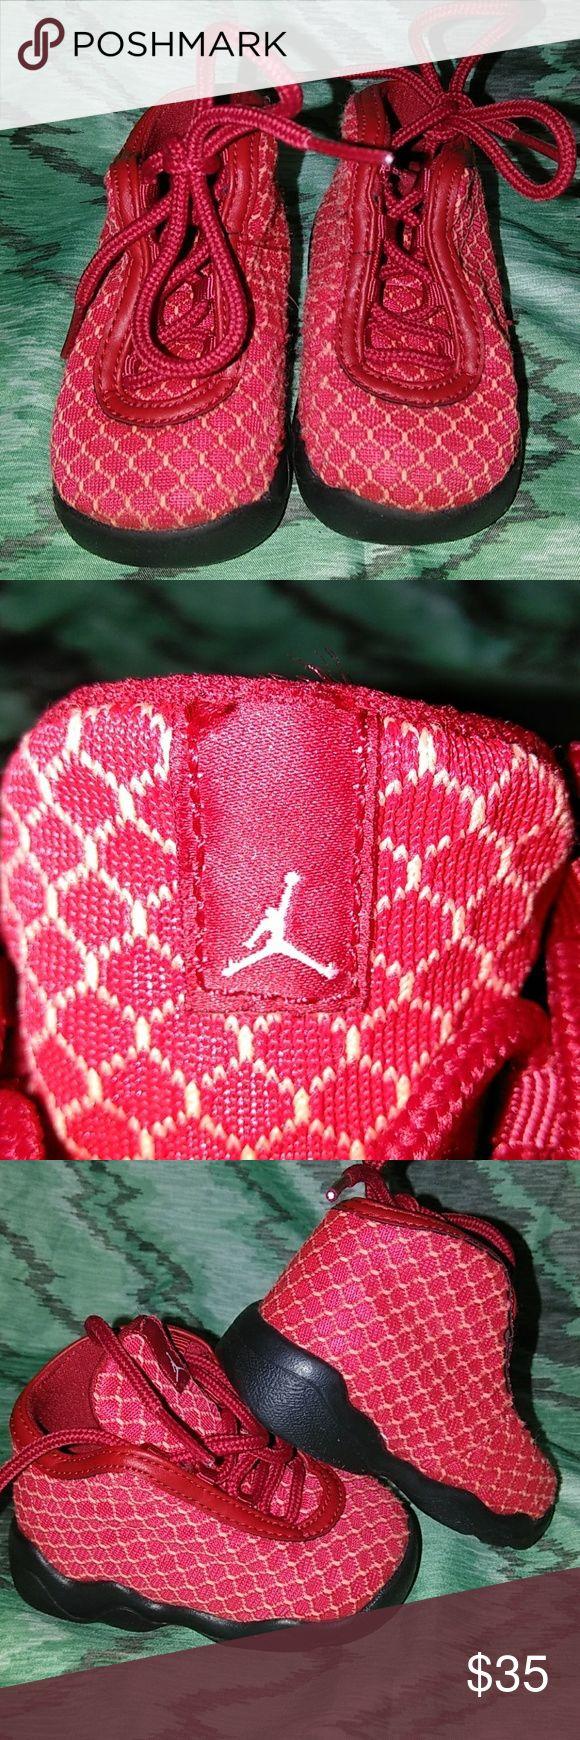 Size 4c red Jordan horizon Red and black EUC size 4c toddler Jordan horizon. No box. Jordan Shoes Sneakers